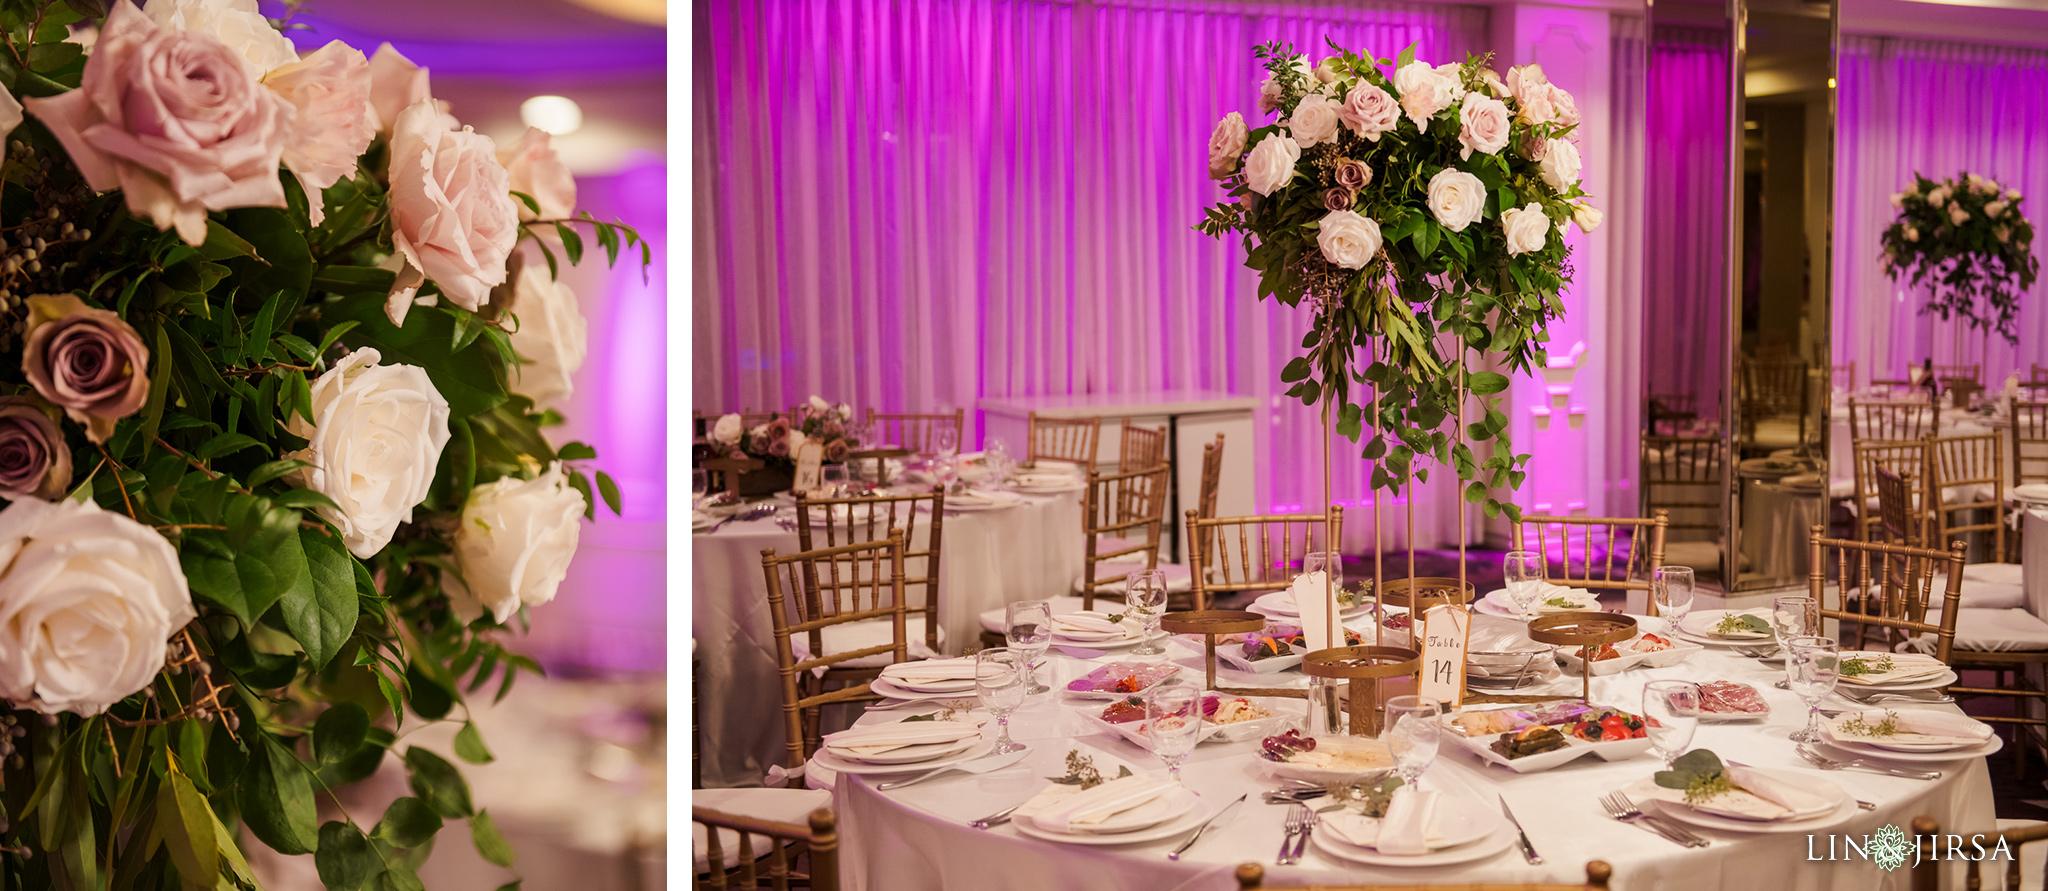 30 grandview ballroom glendale wedding photography